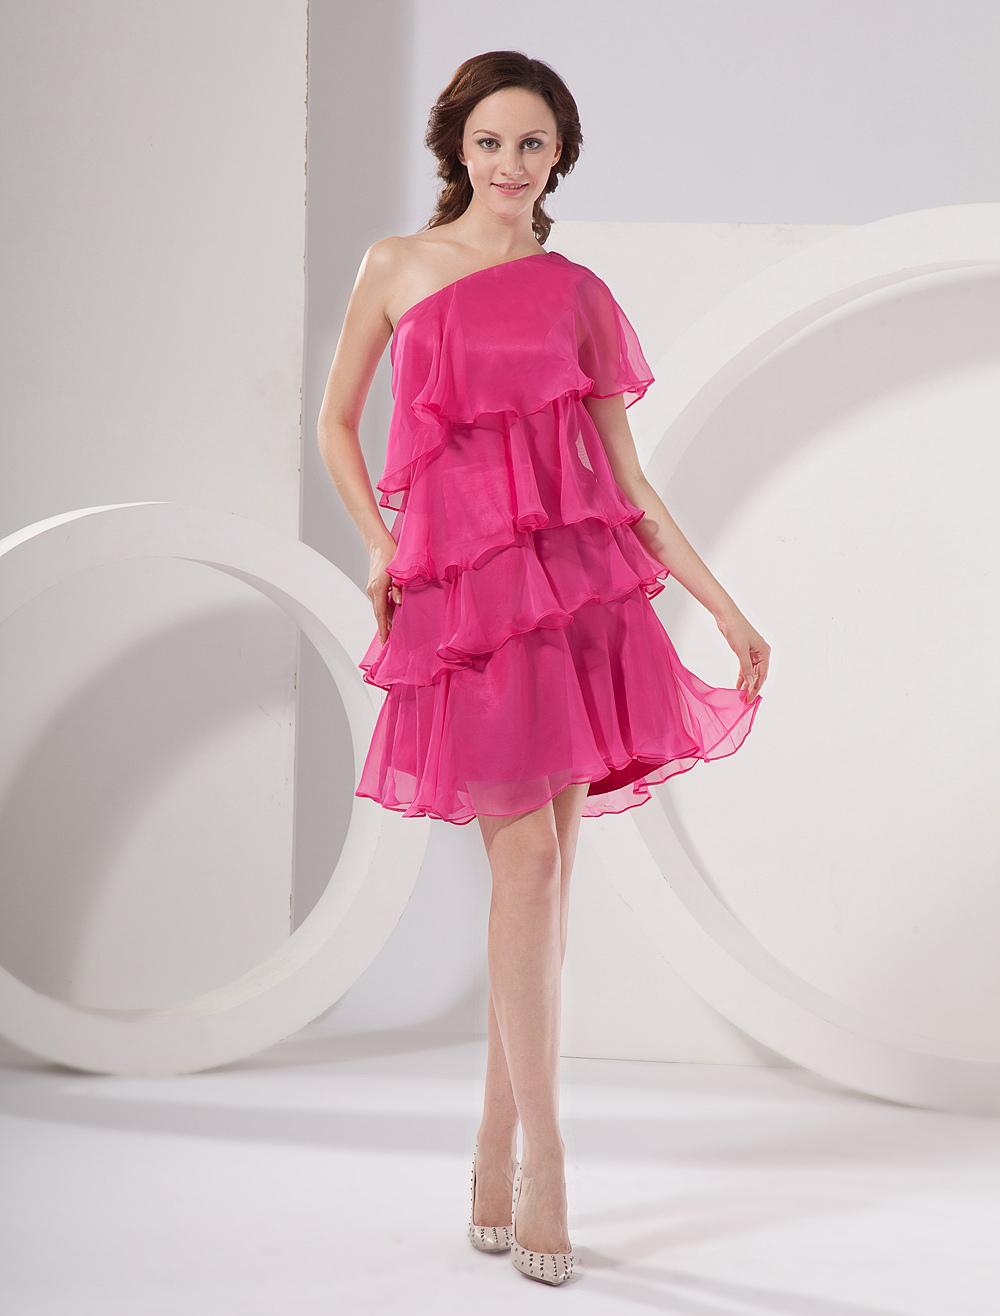 Hot Pink Homecoming Dress One Shoulder A Line Chiffon Layered Prom Dress (Wedding Cheap Party Dress) photo